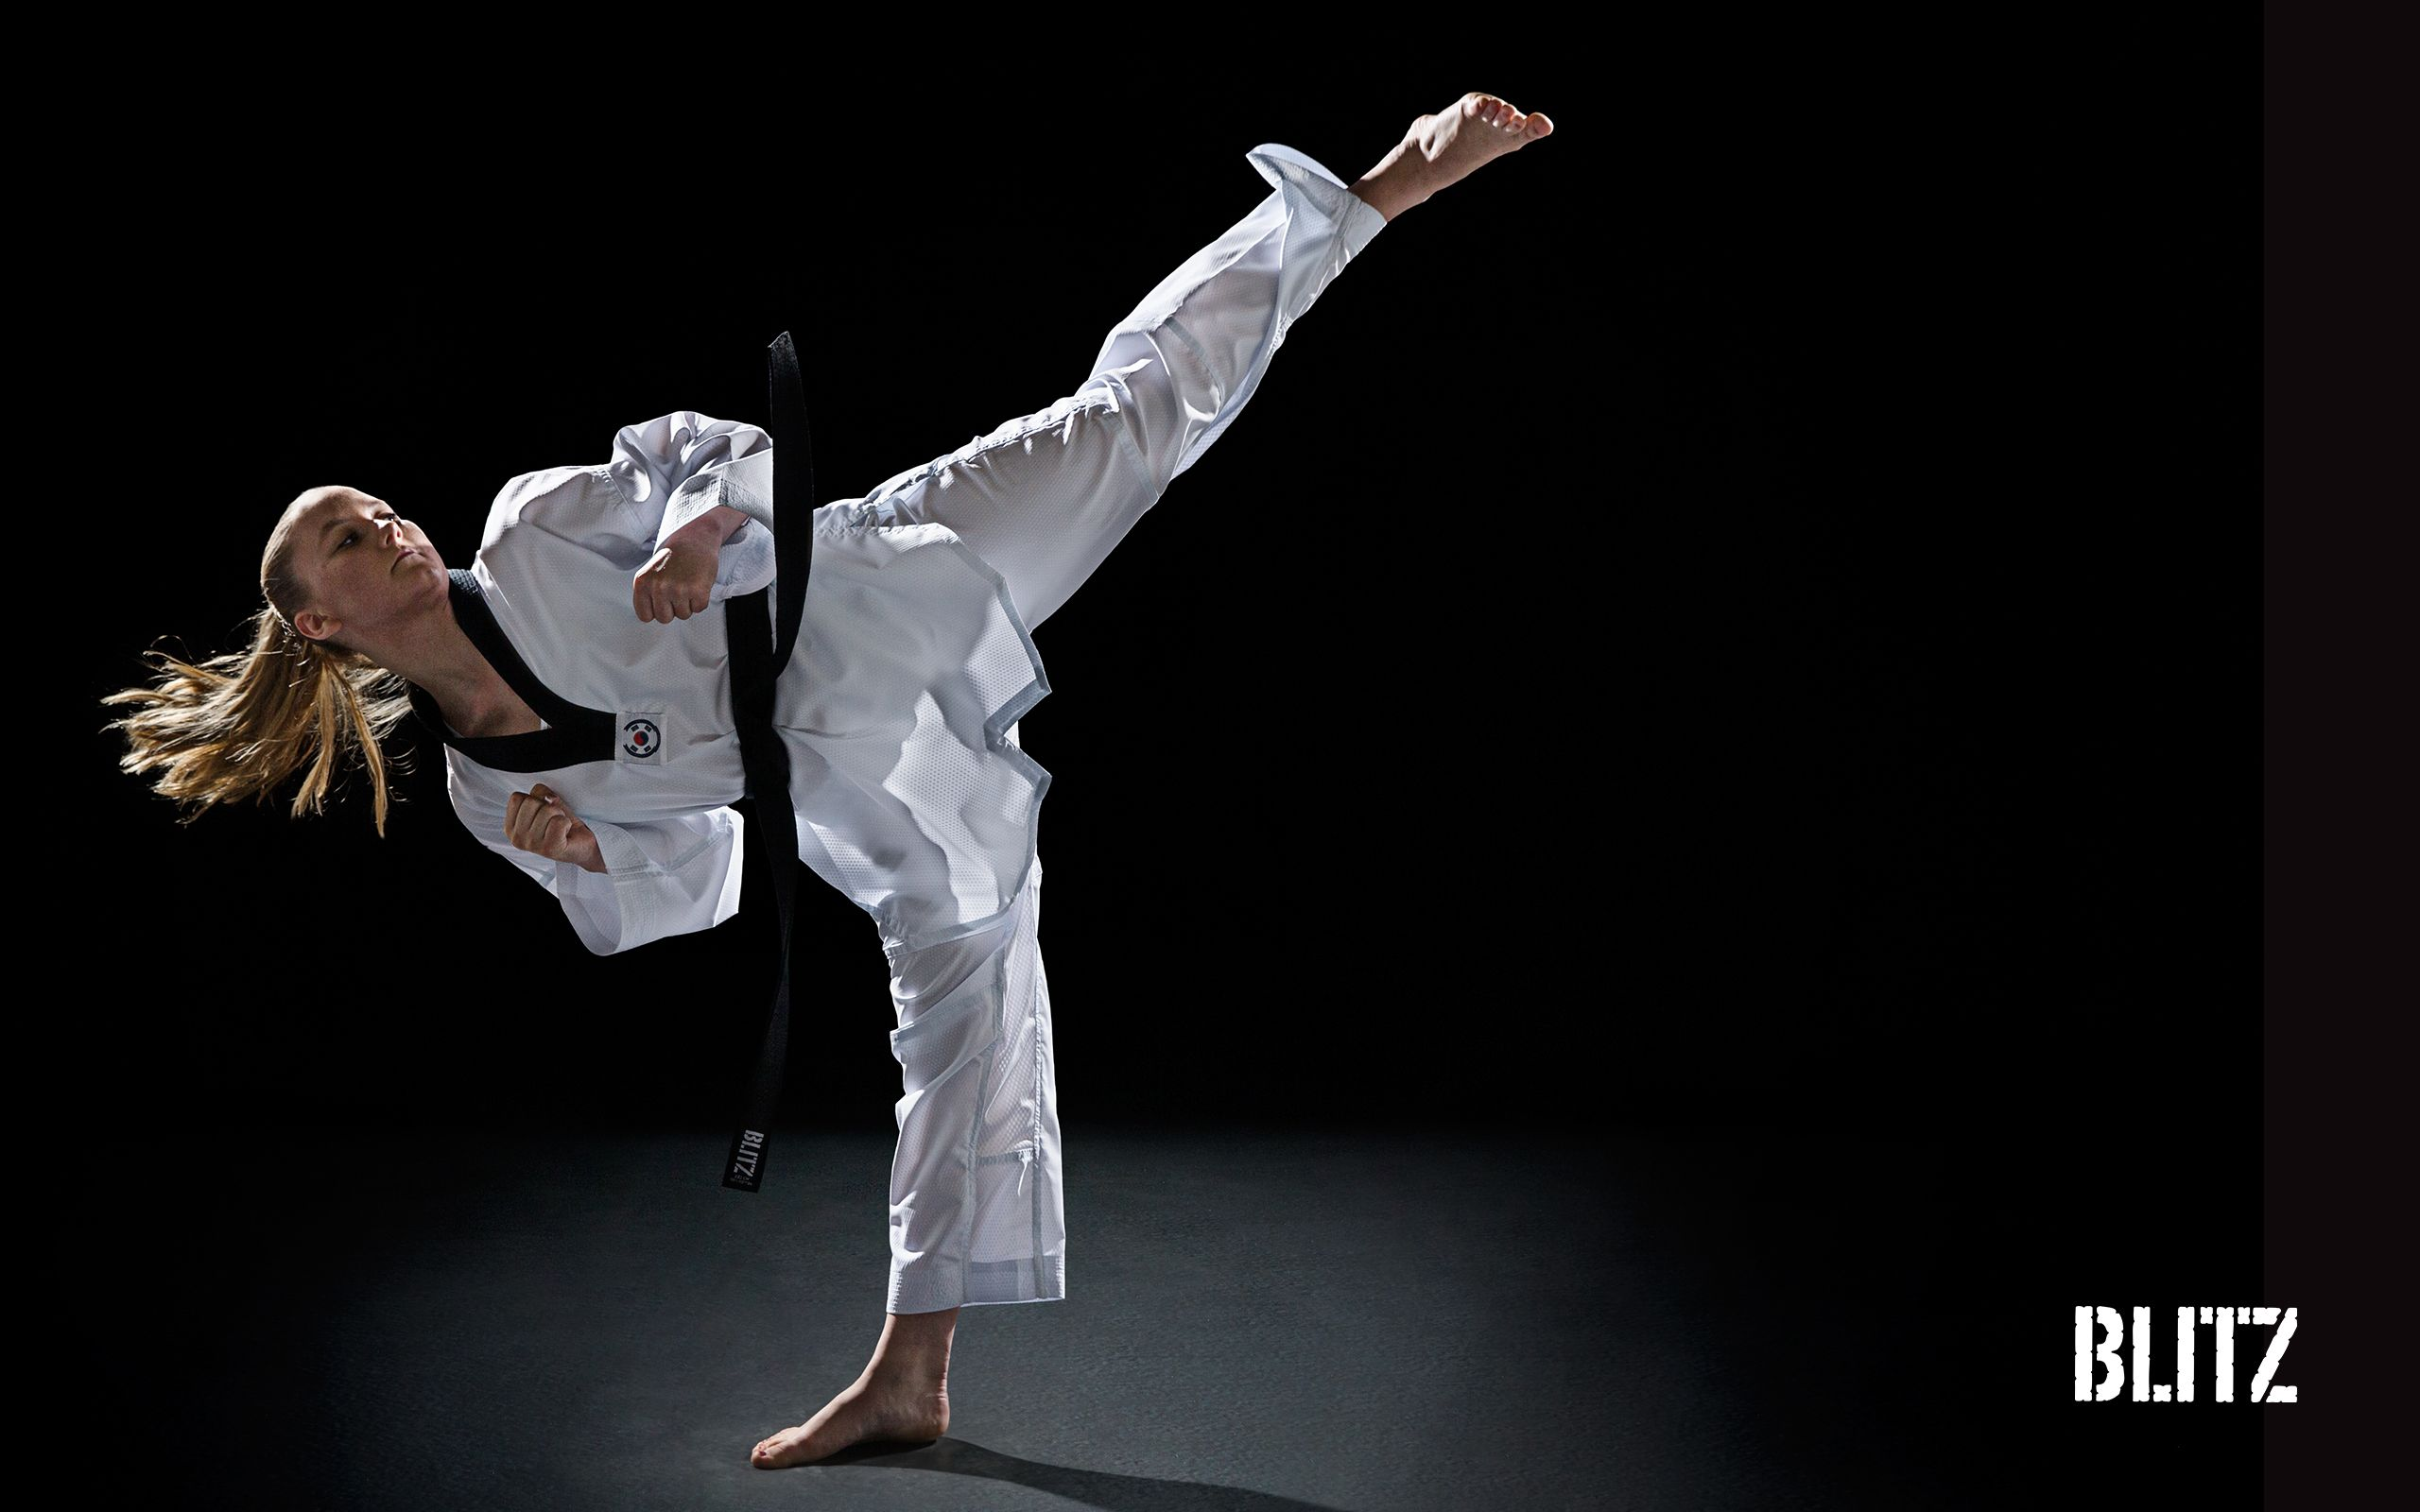 Wallpaper Iphone Mobile Sport: Taekwondo Free HD Desktop And Mobile Wallpaper